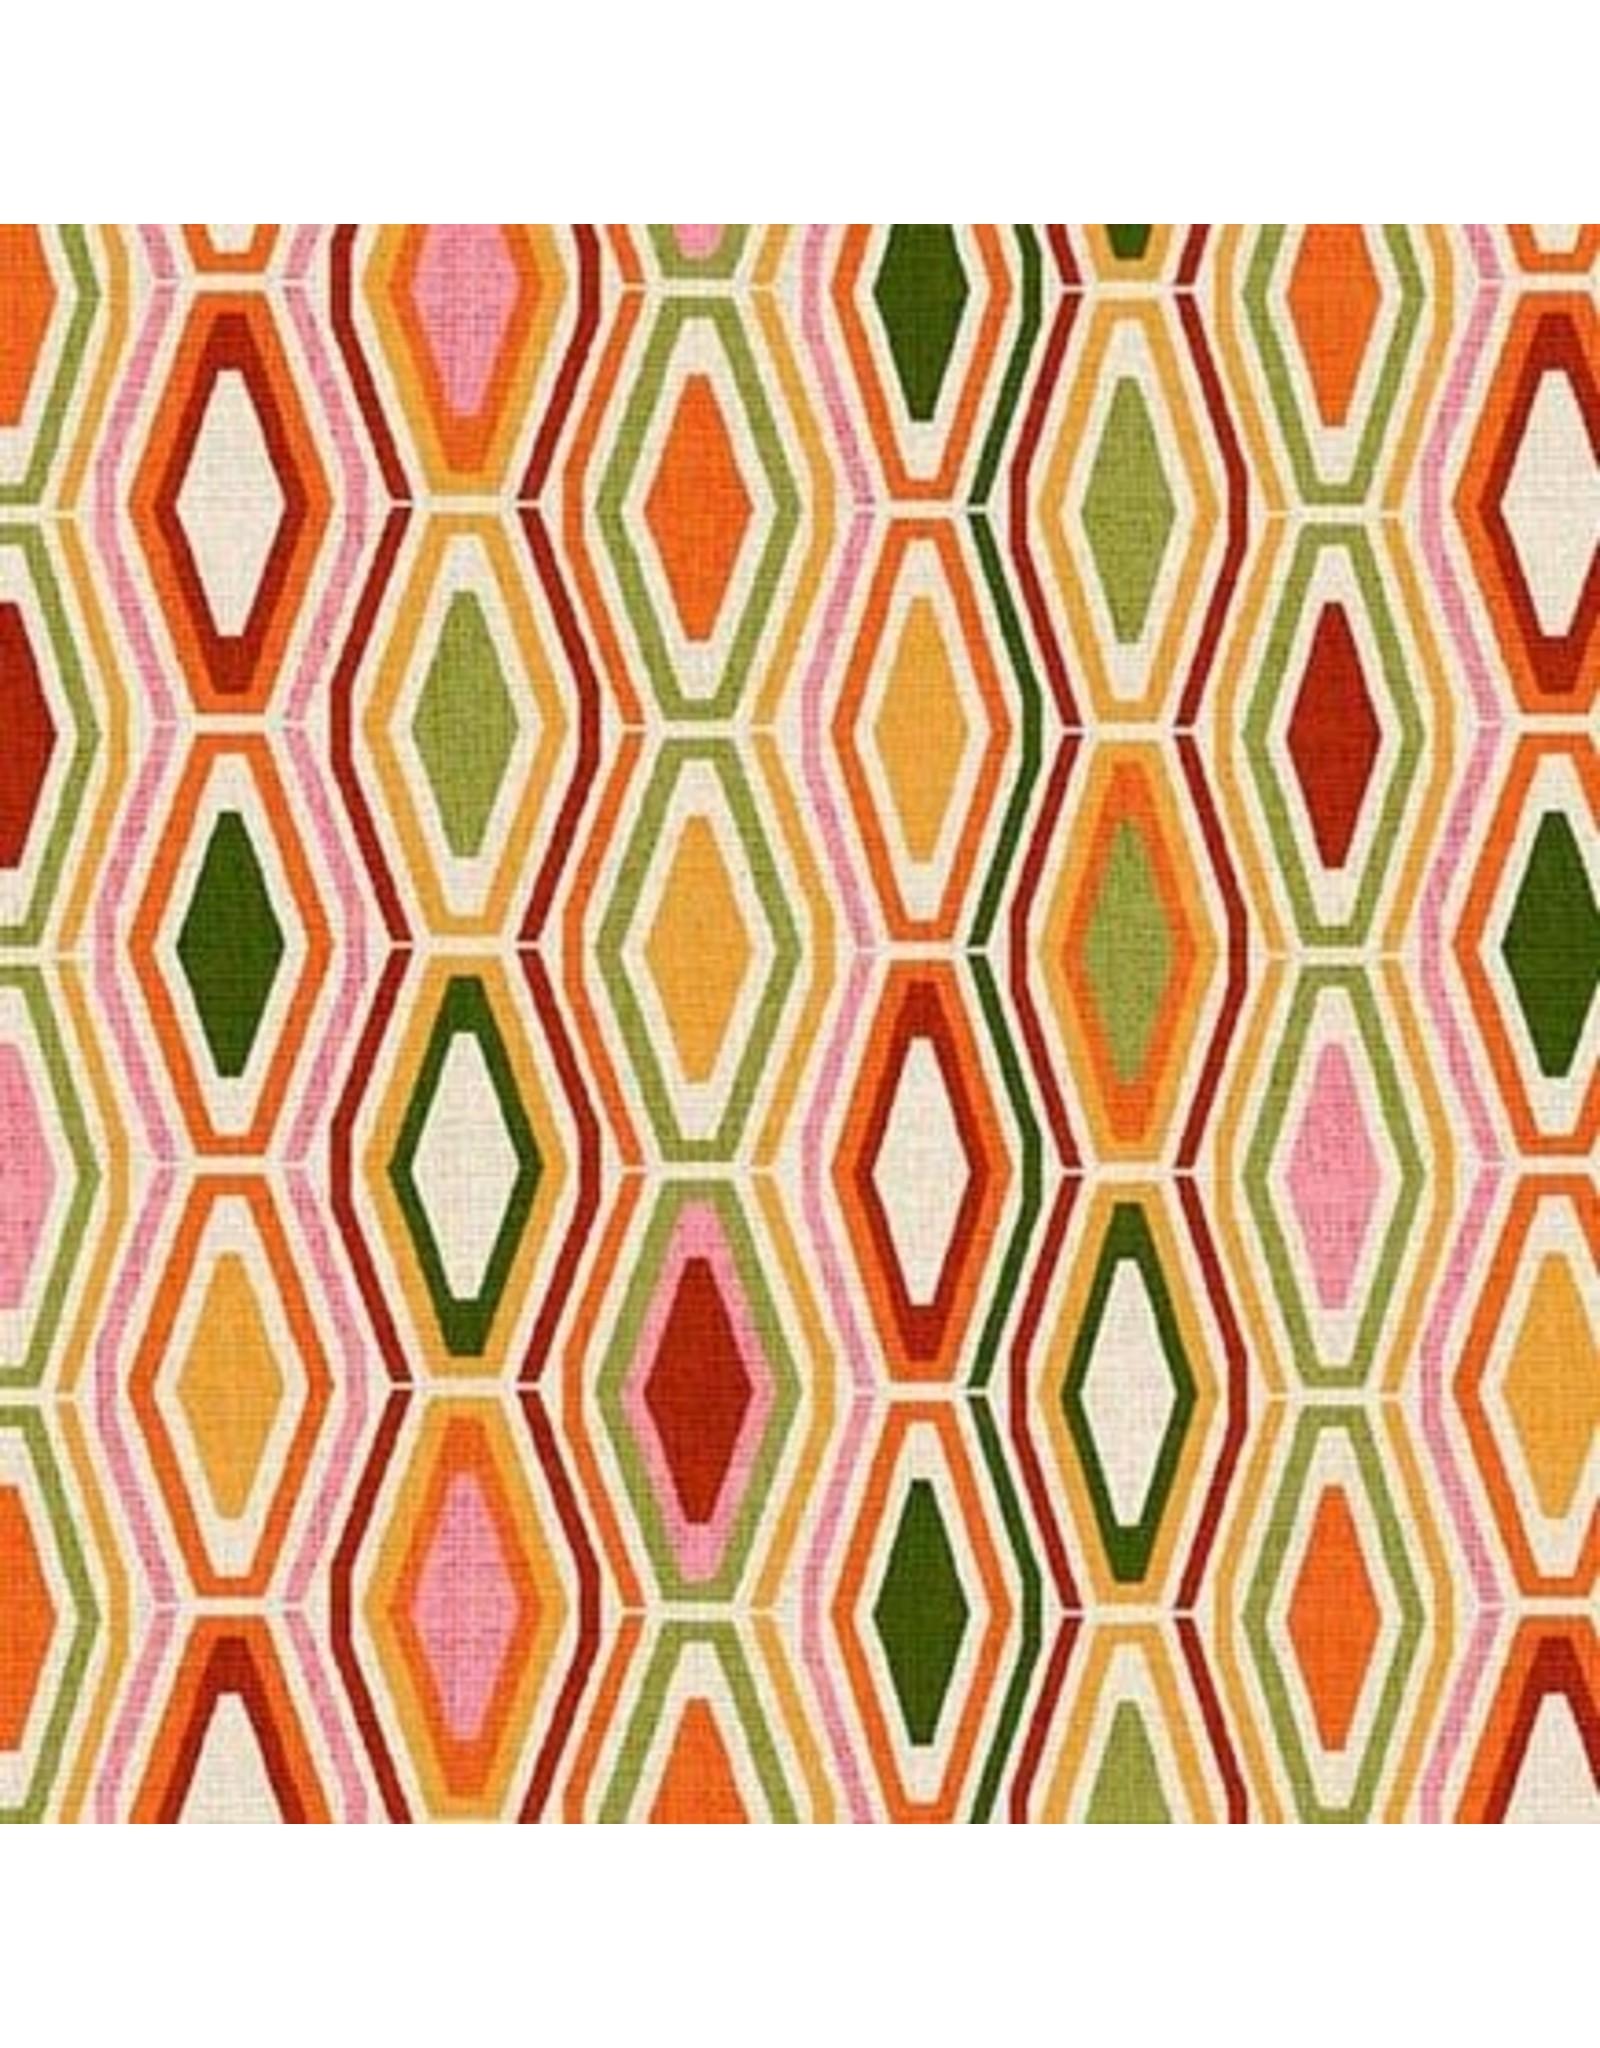 Michael Miller Harvest Tribute, Artful Accents in Cream, Fabric Half-Yards